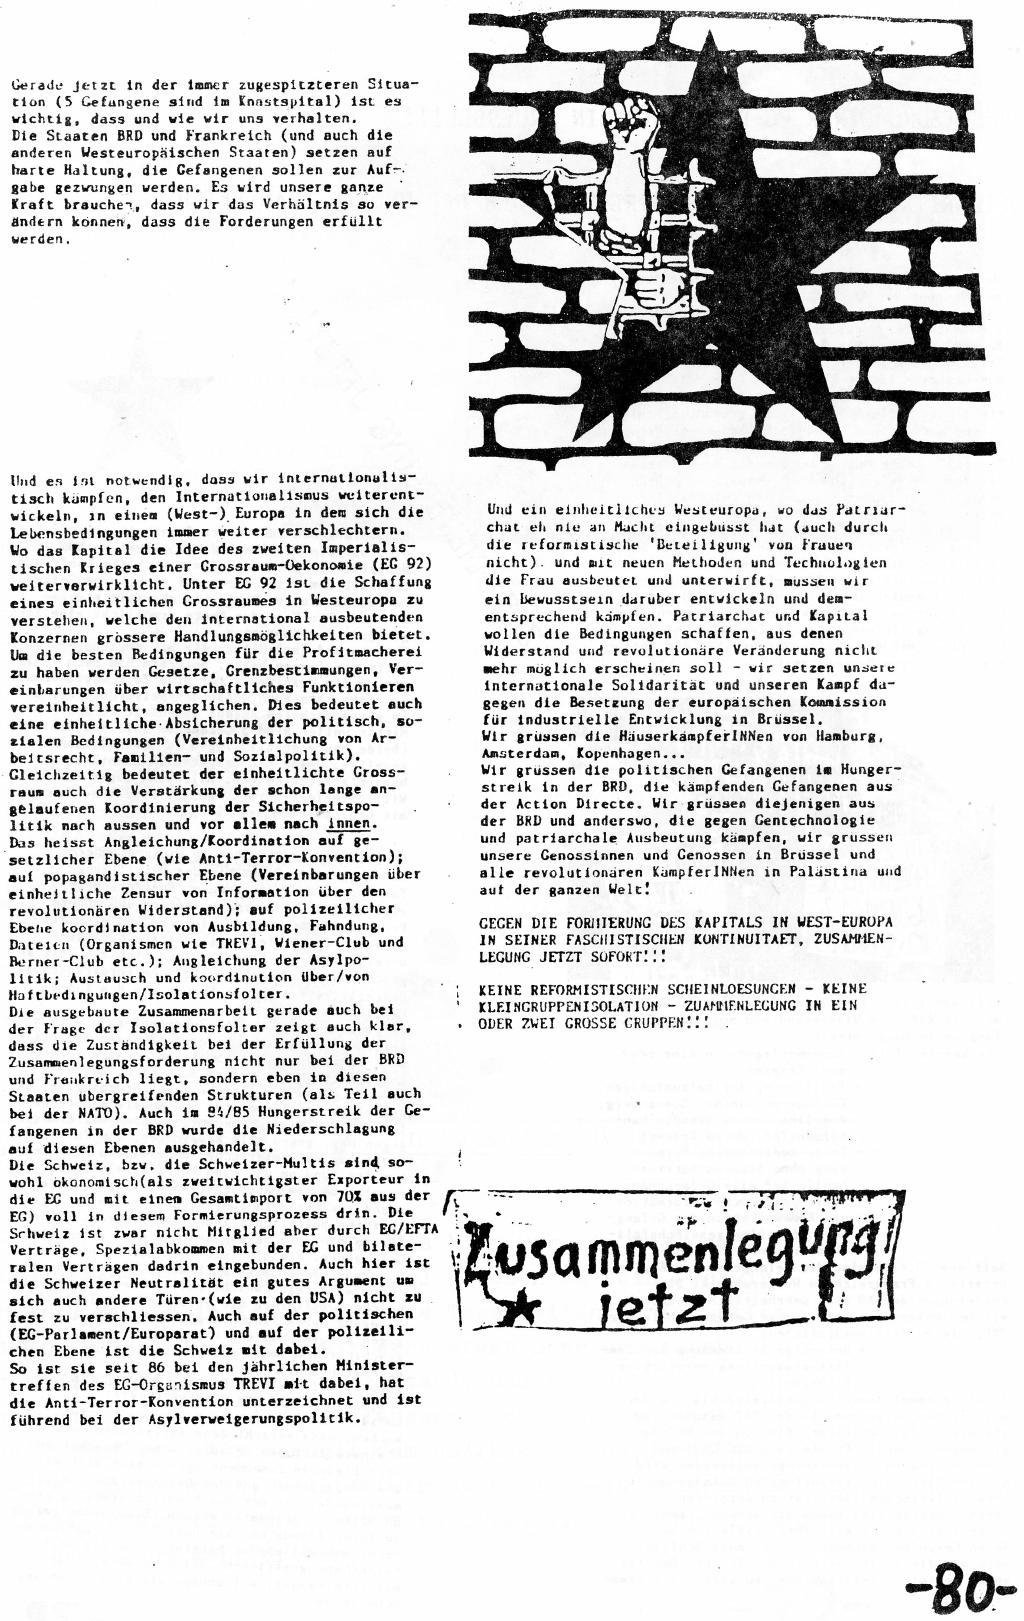 Belgien_Doku_Besetzung_EG_Kommission_1989_082